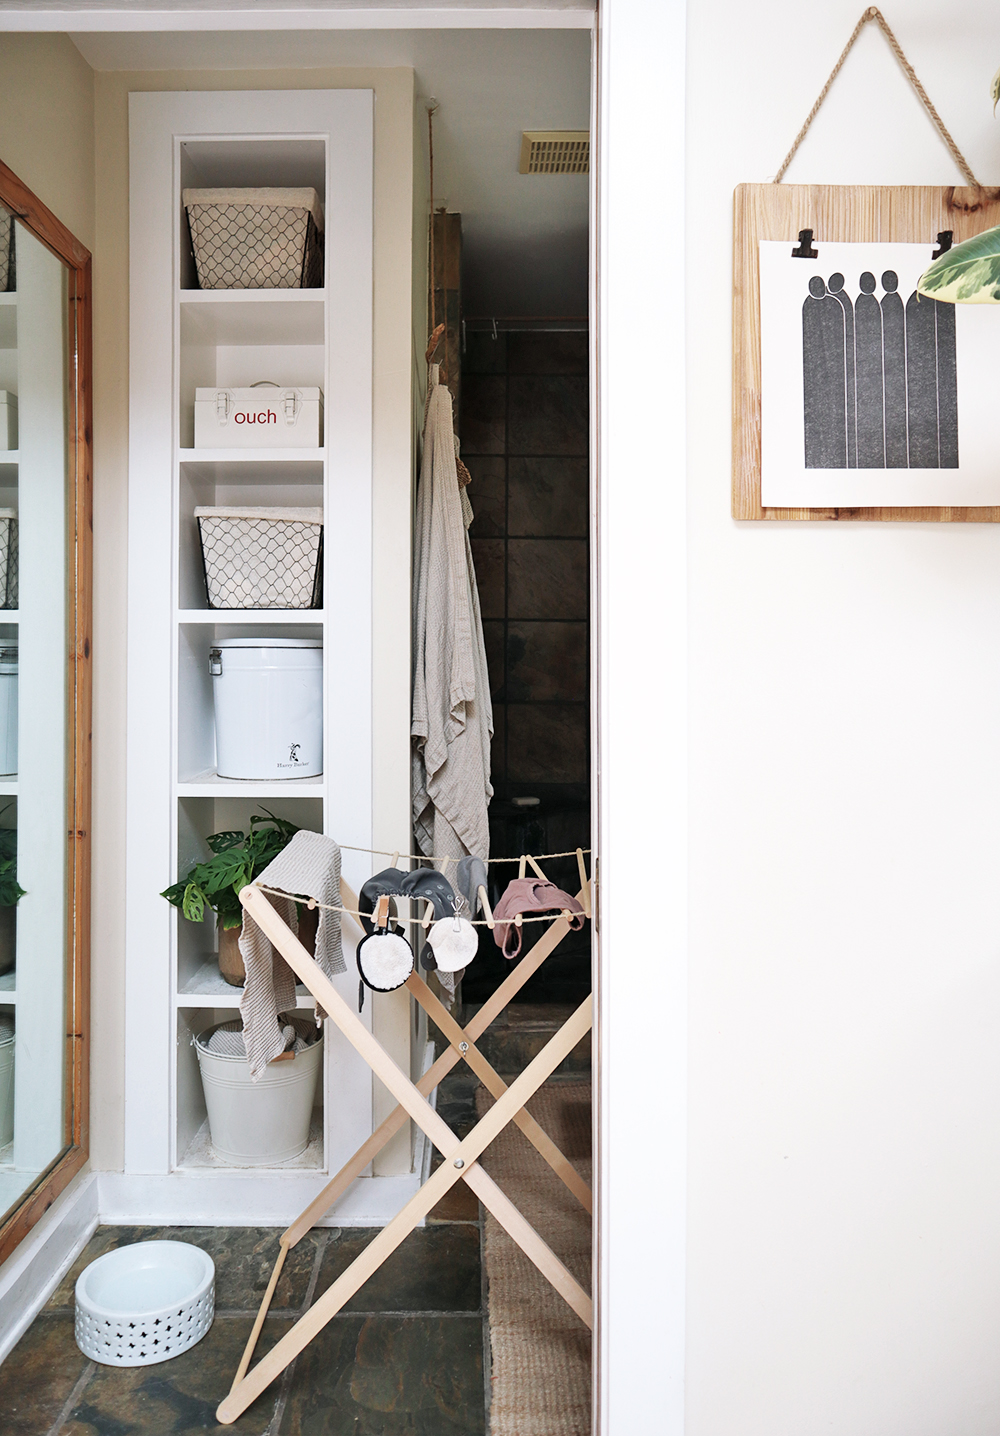 swaps_feature_smallbathroom.jpg